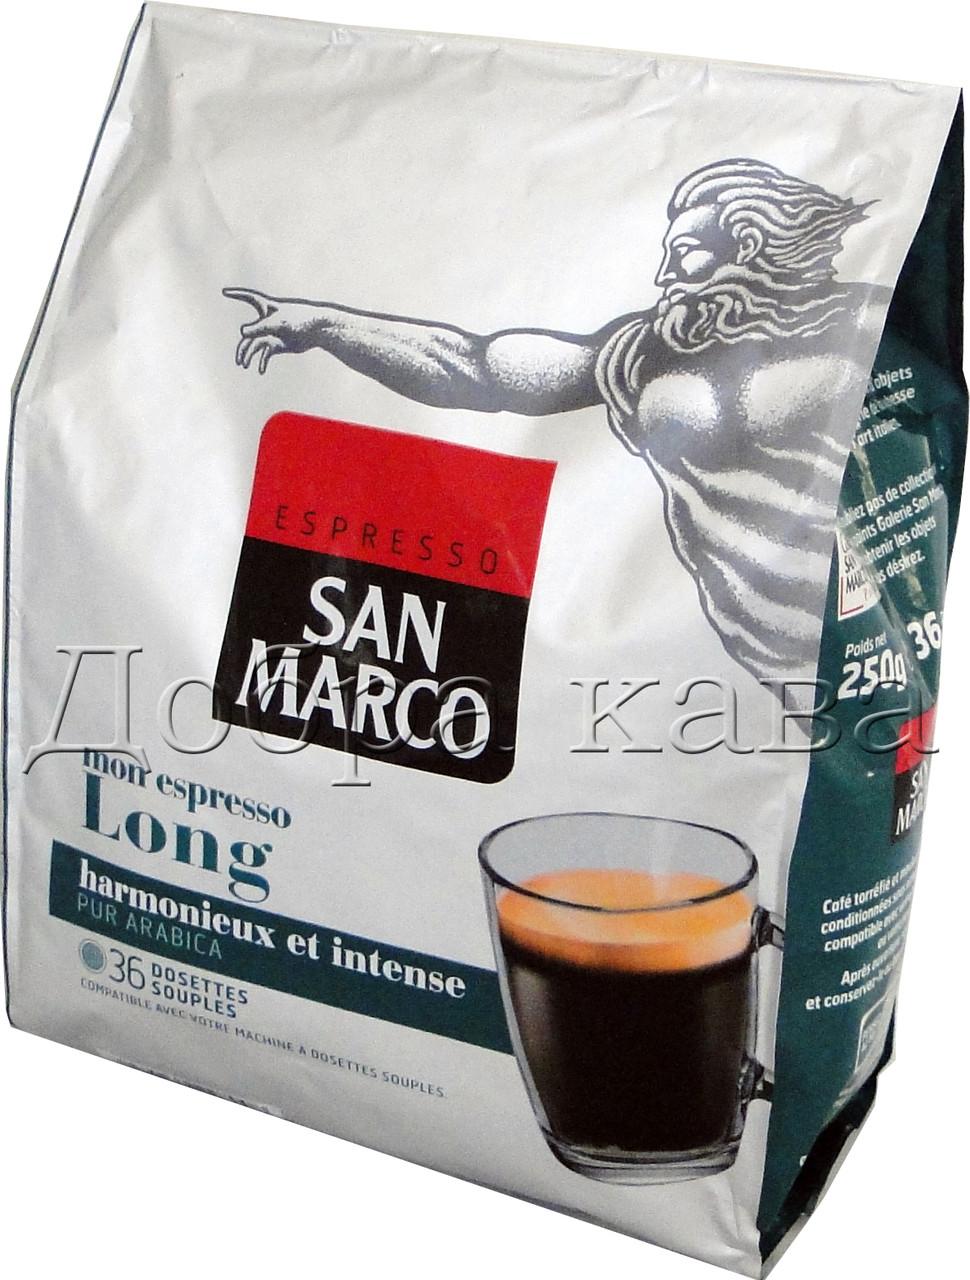 Кофе в чалдах для Philips Senseo 36шт San Marco LONG (100% Арабика)